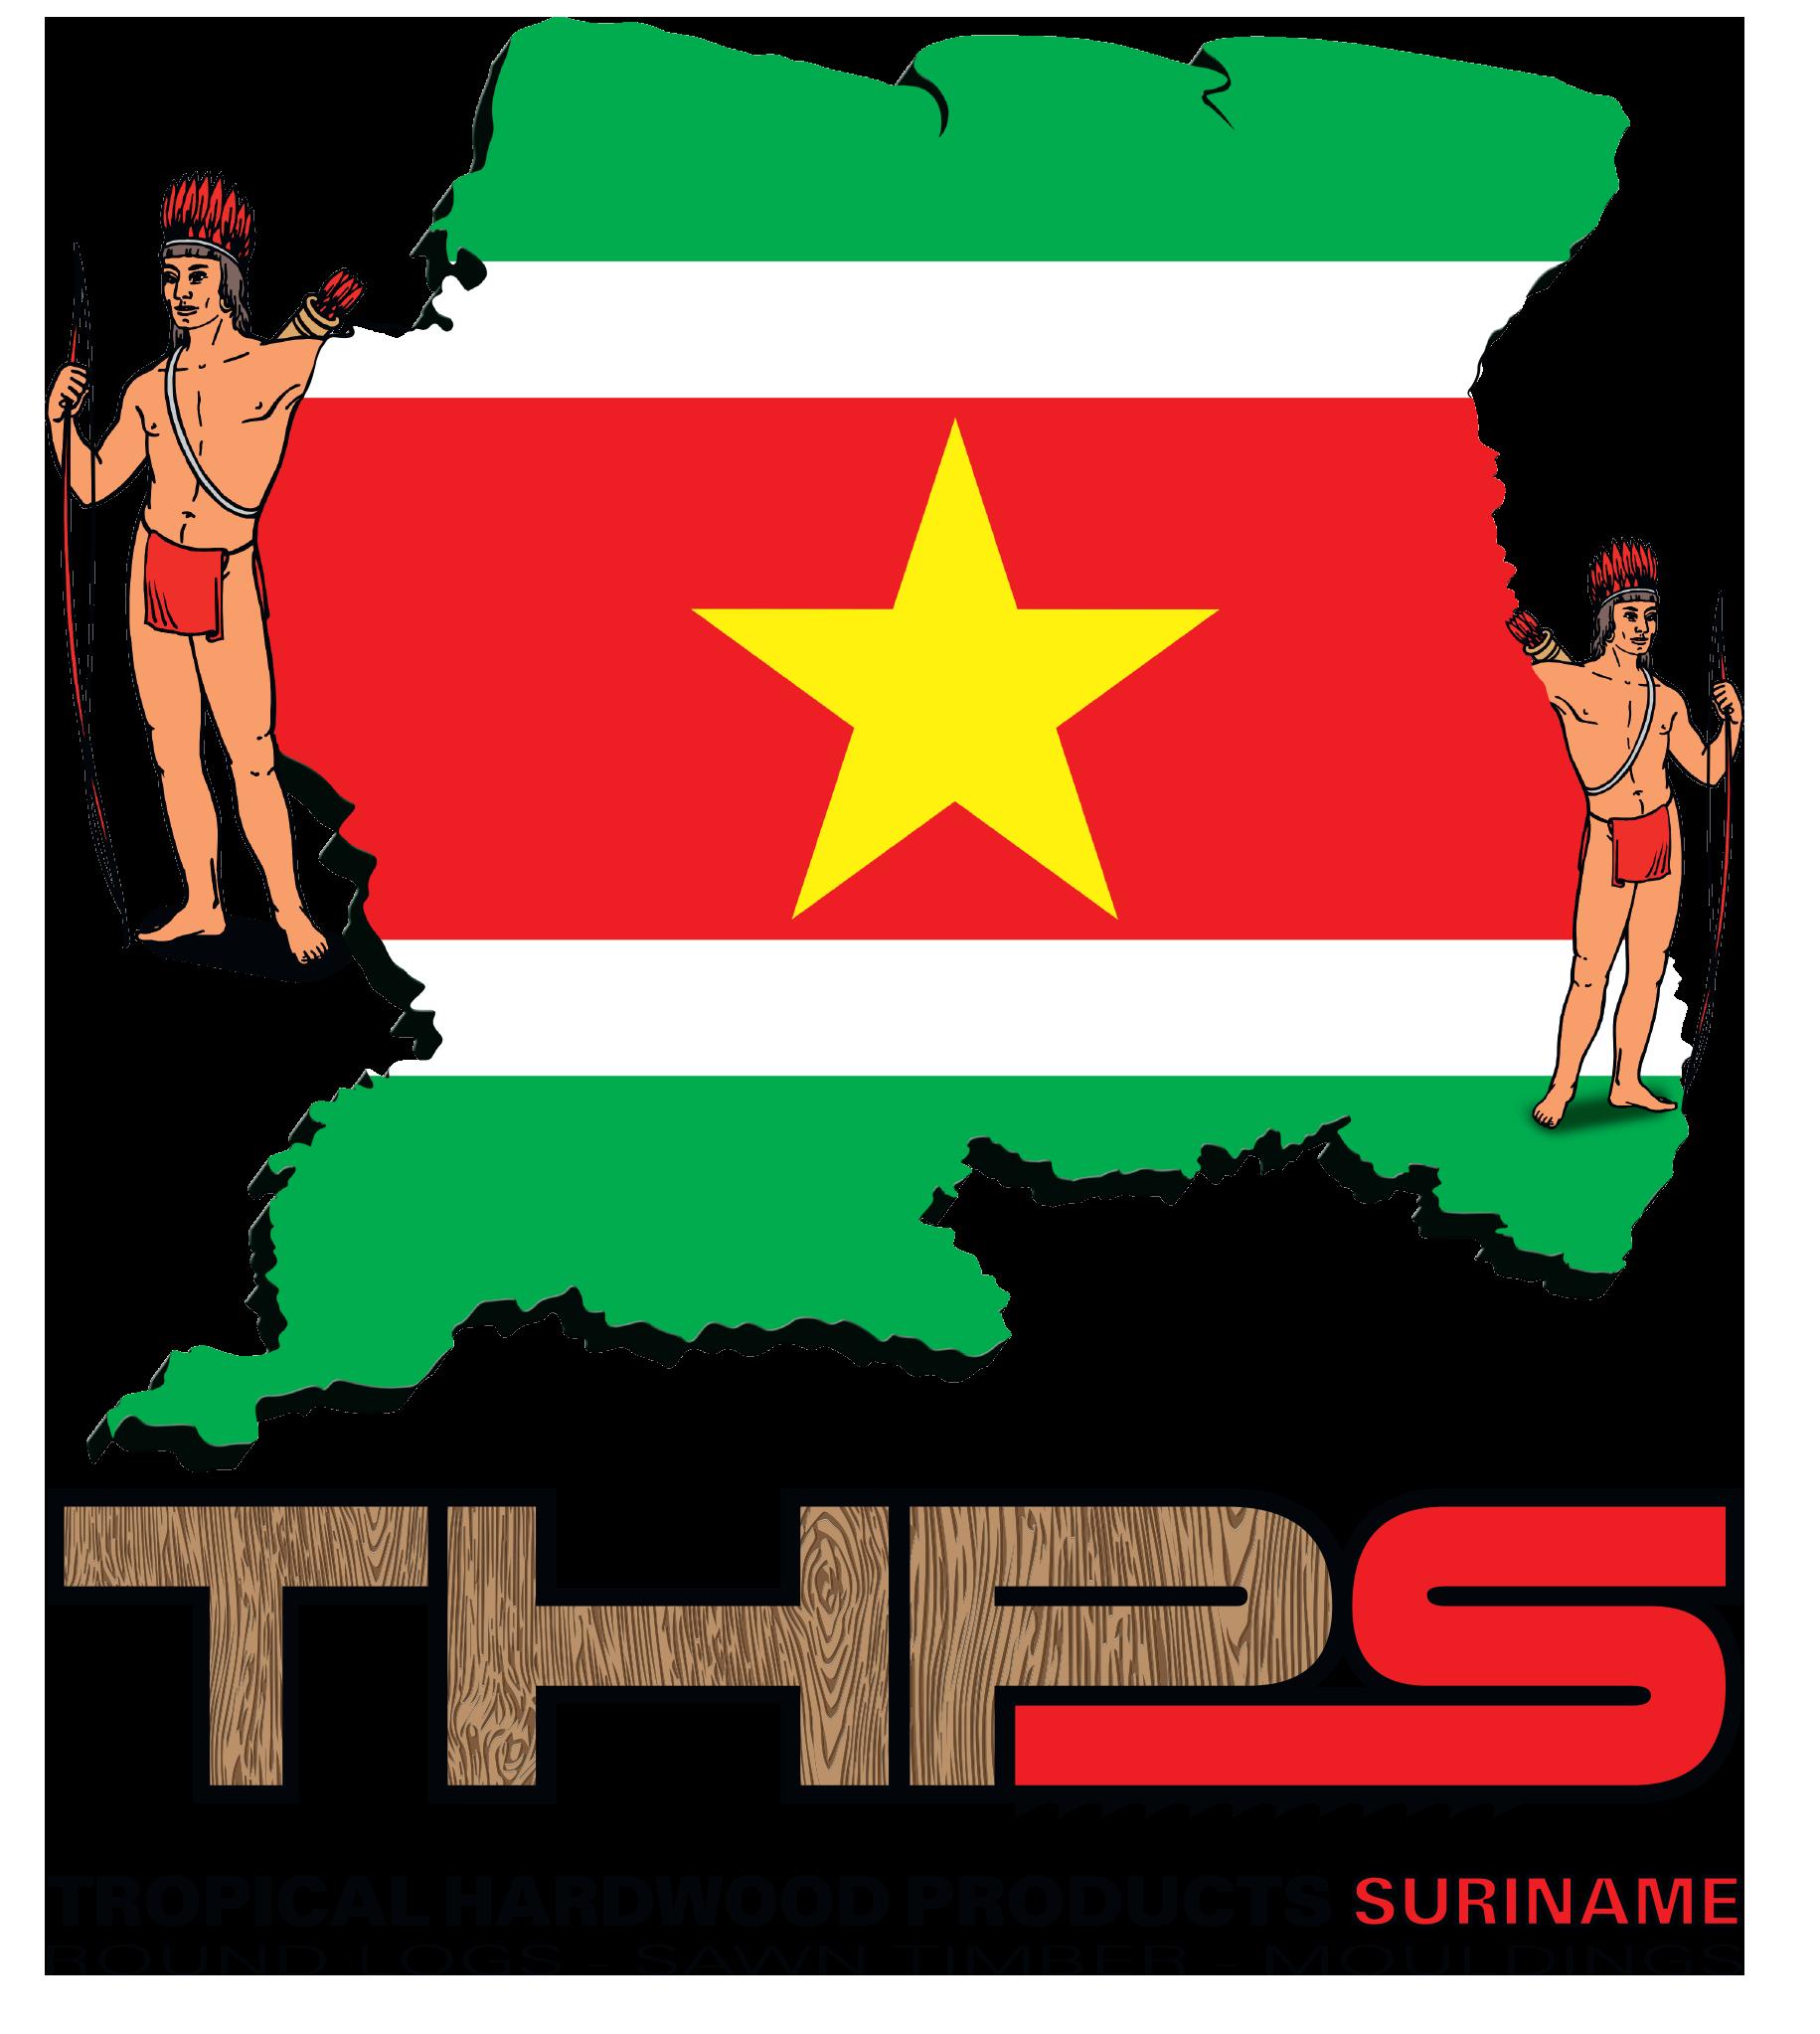 thps_logo_big.png